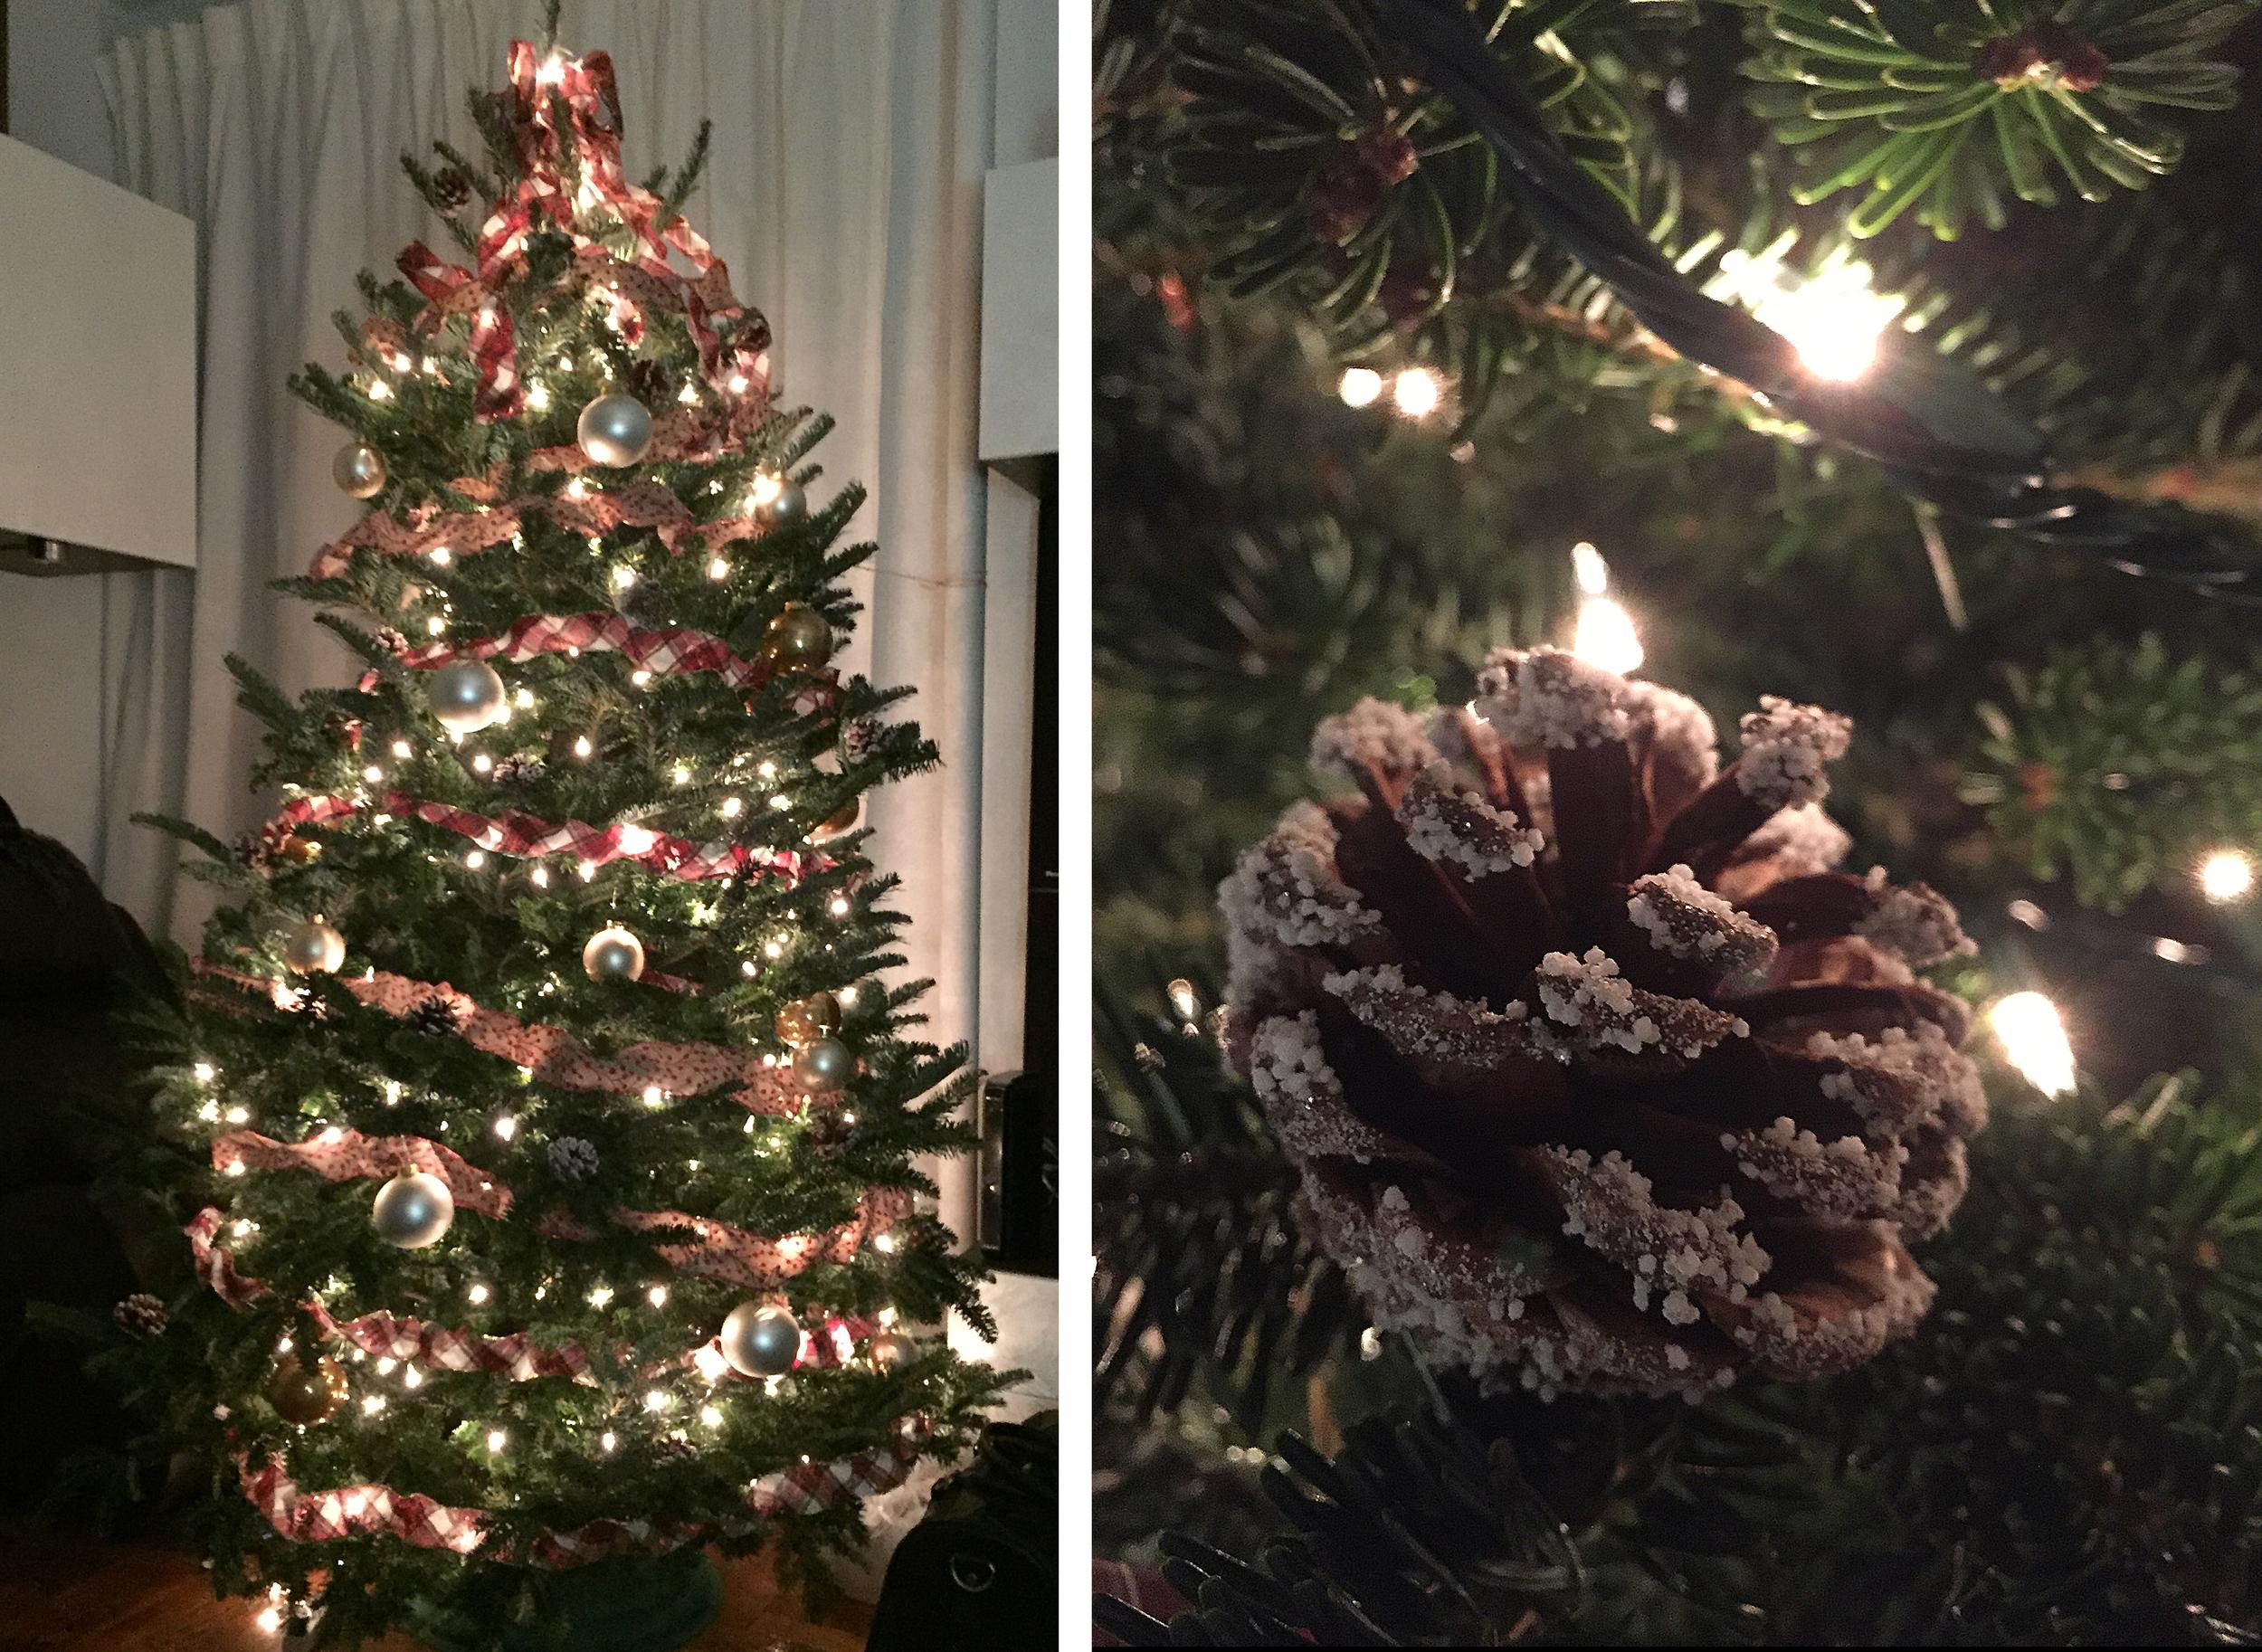 Christmas tree 100% natural. 2015 Holidays